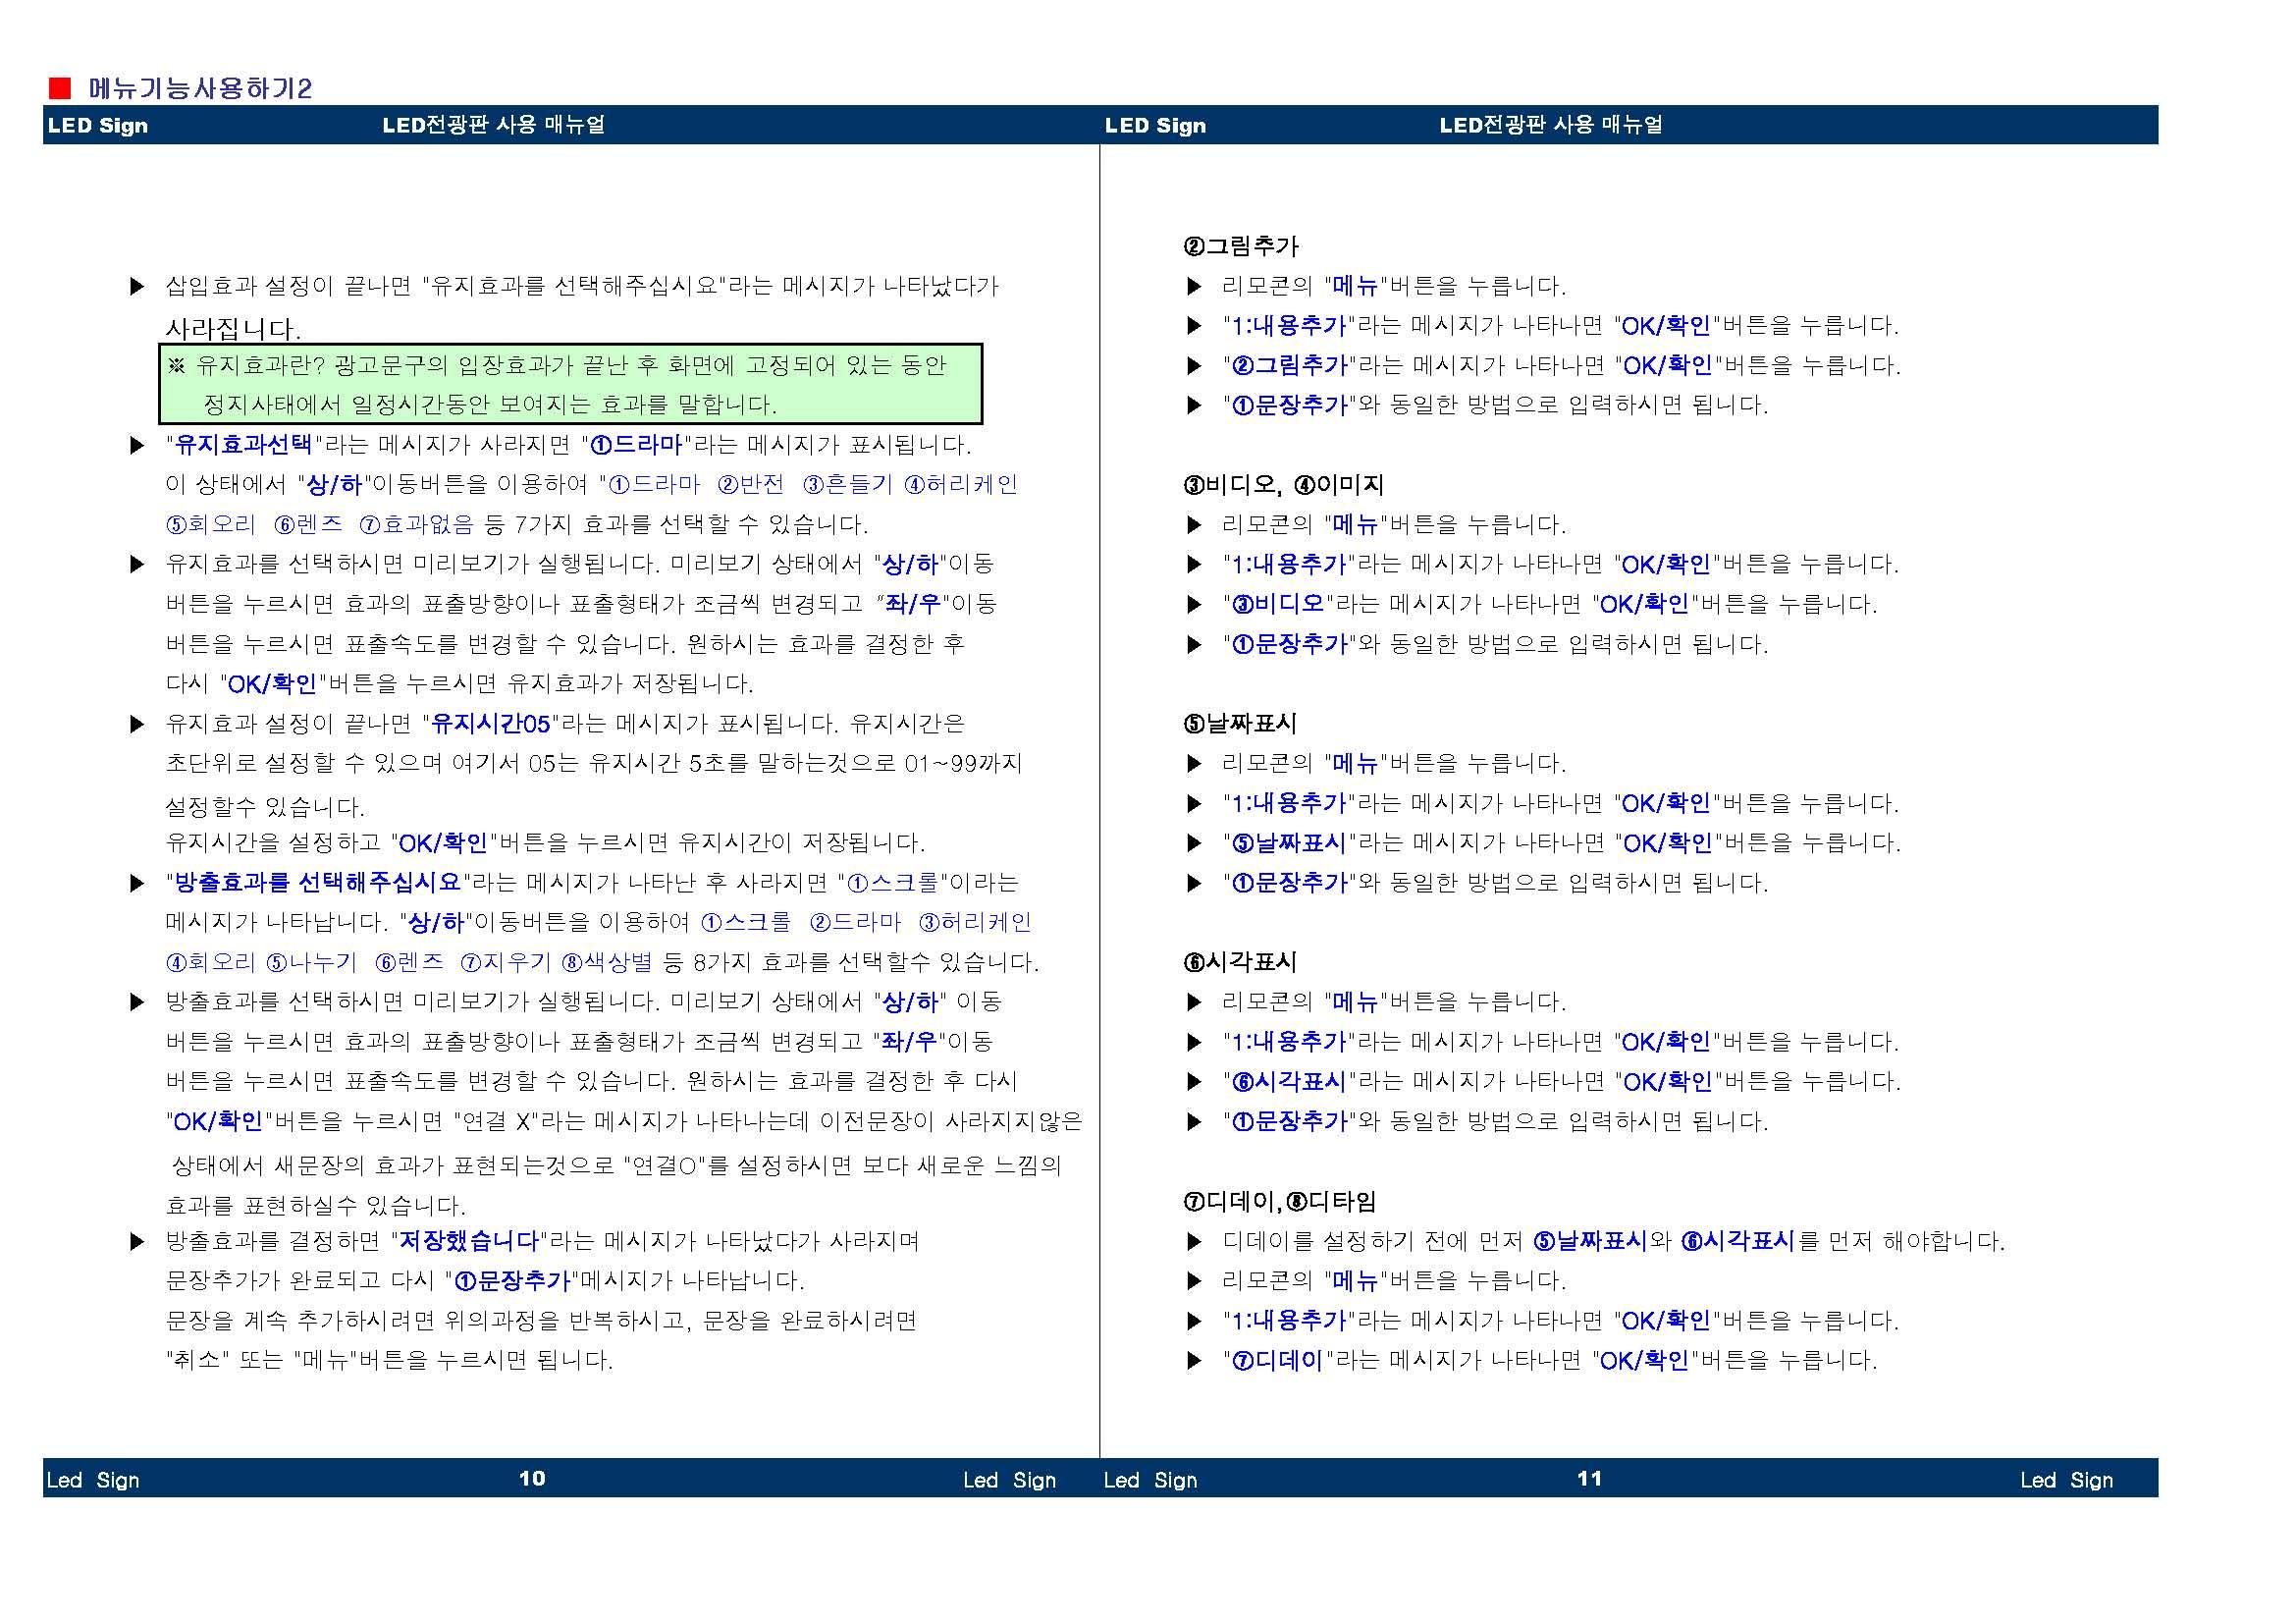 LedSign사용설명서_페이지_05.jpg